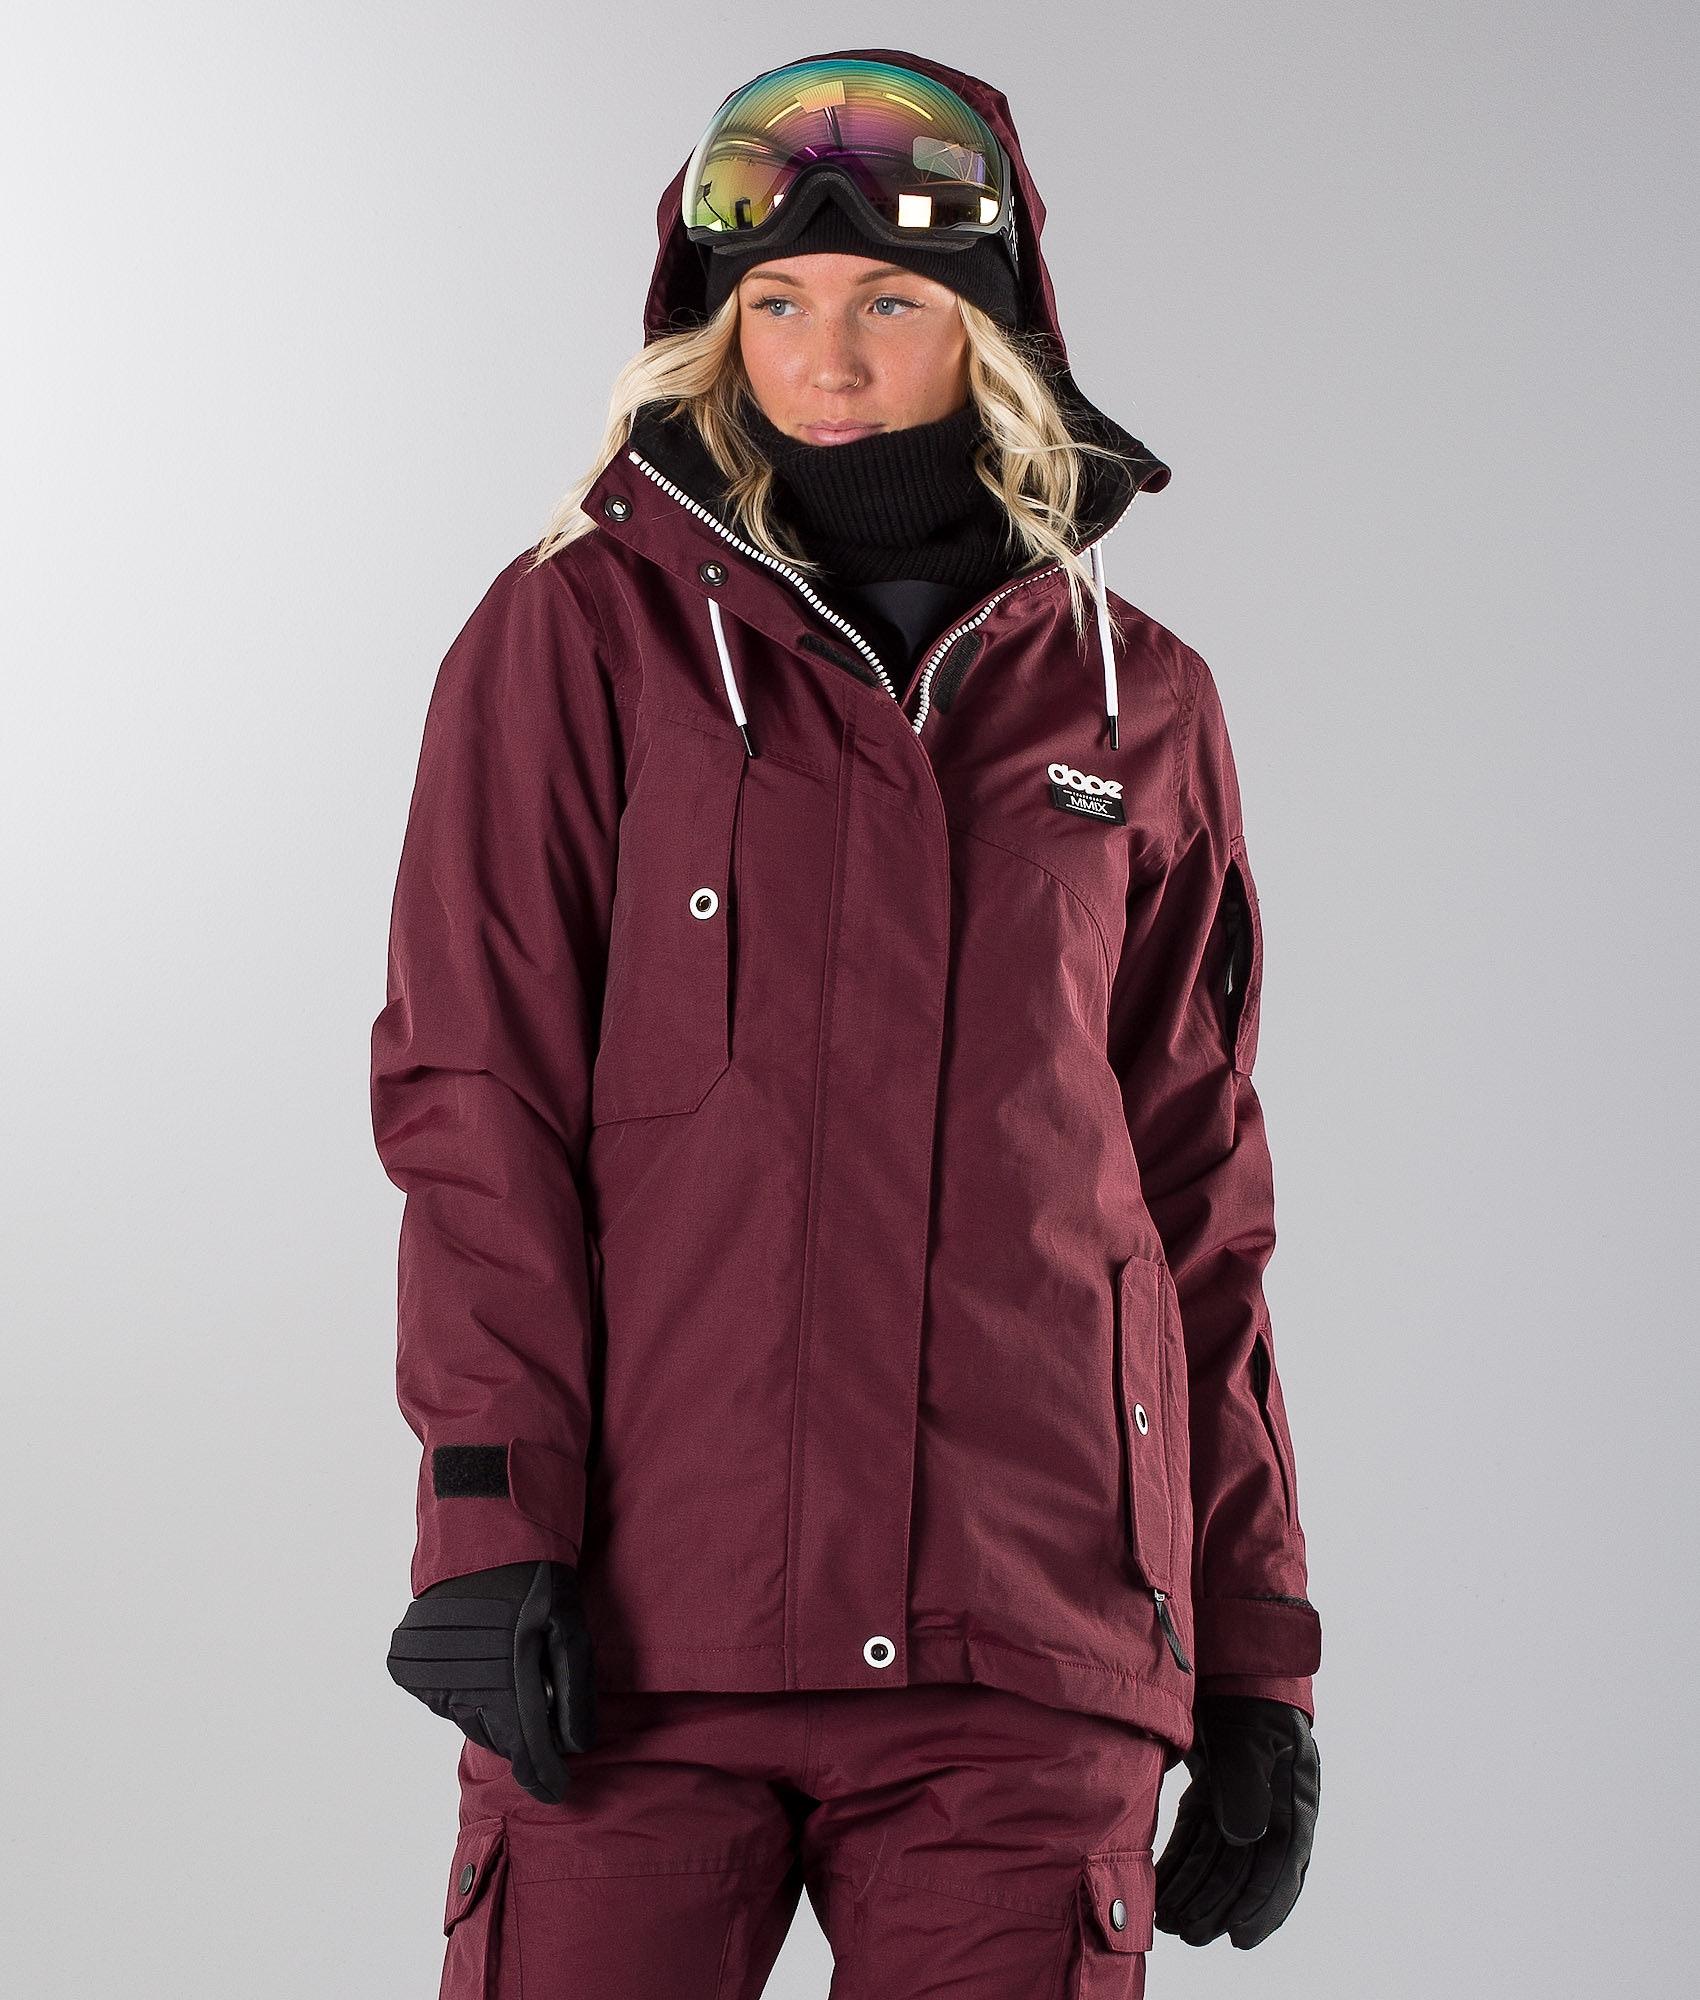 Winterjas Zonder Bont.Ski Jas Dames Snelle Gratis Verzending Ridestore